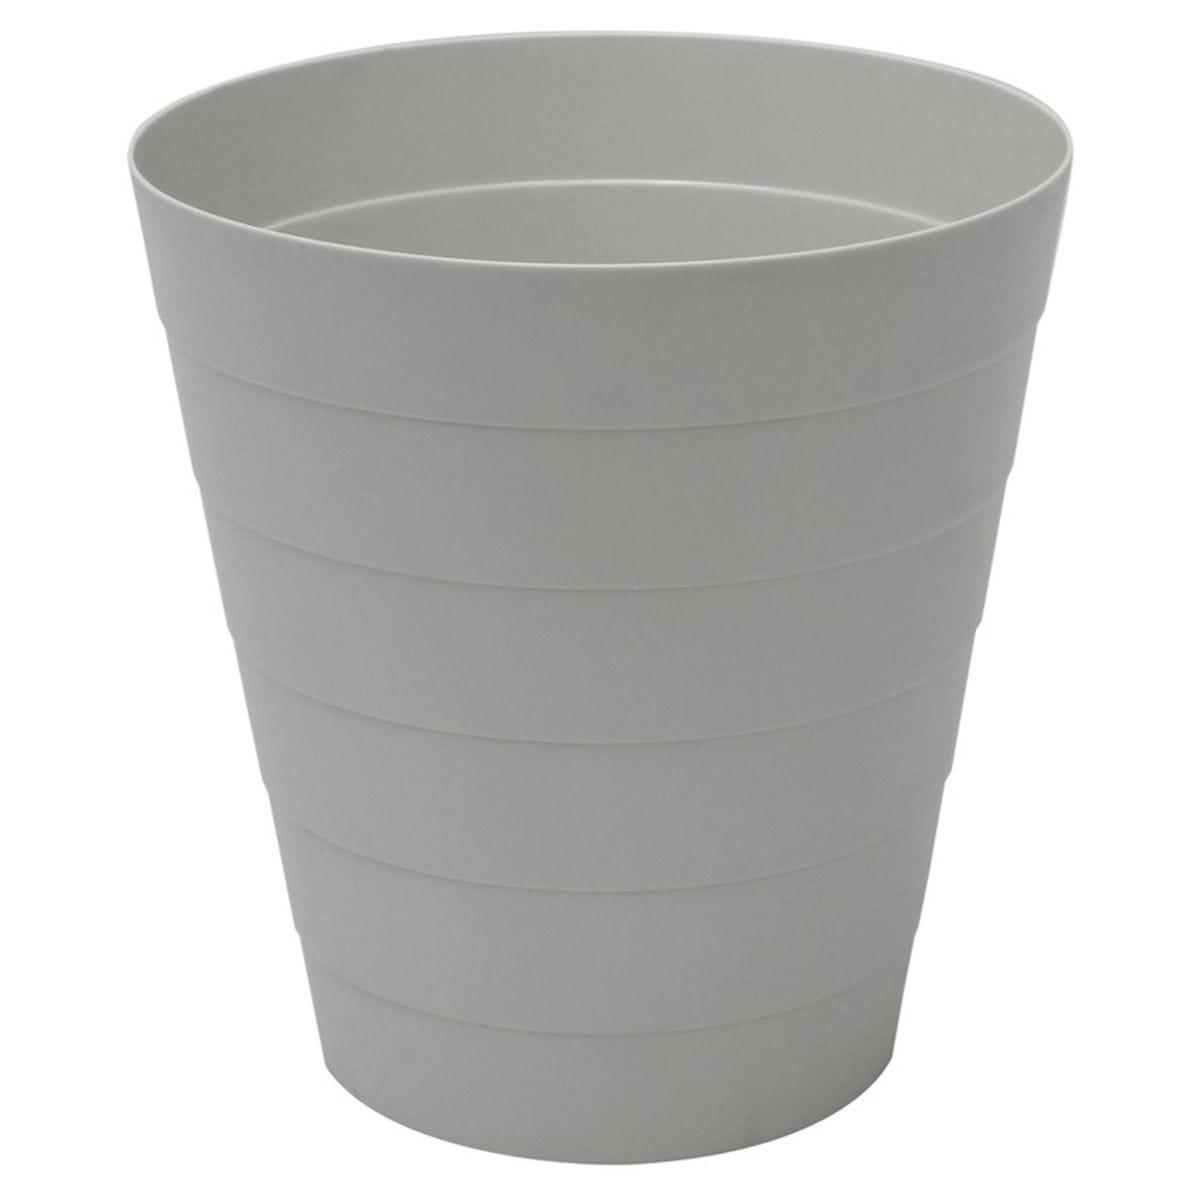 JVL Funktional Plastic 7 Litre Round Bin Grey 25 x 25 x H26cm